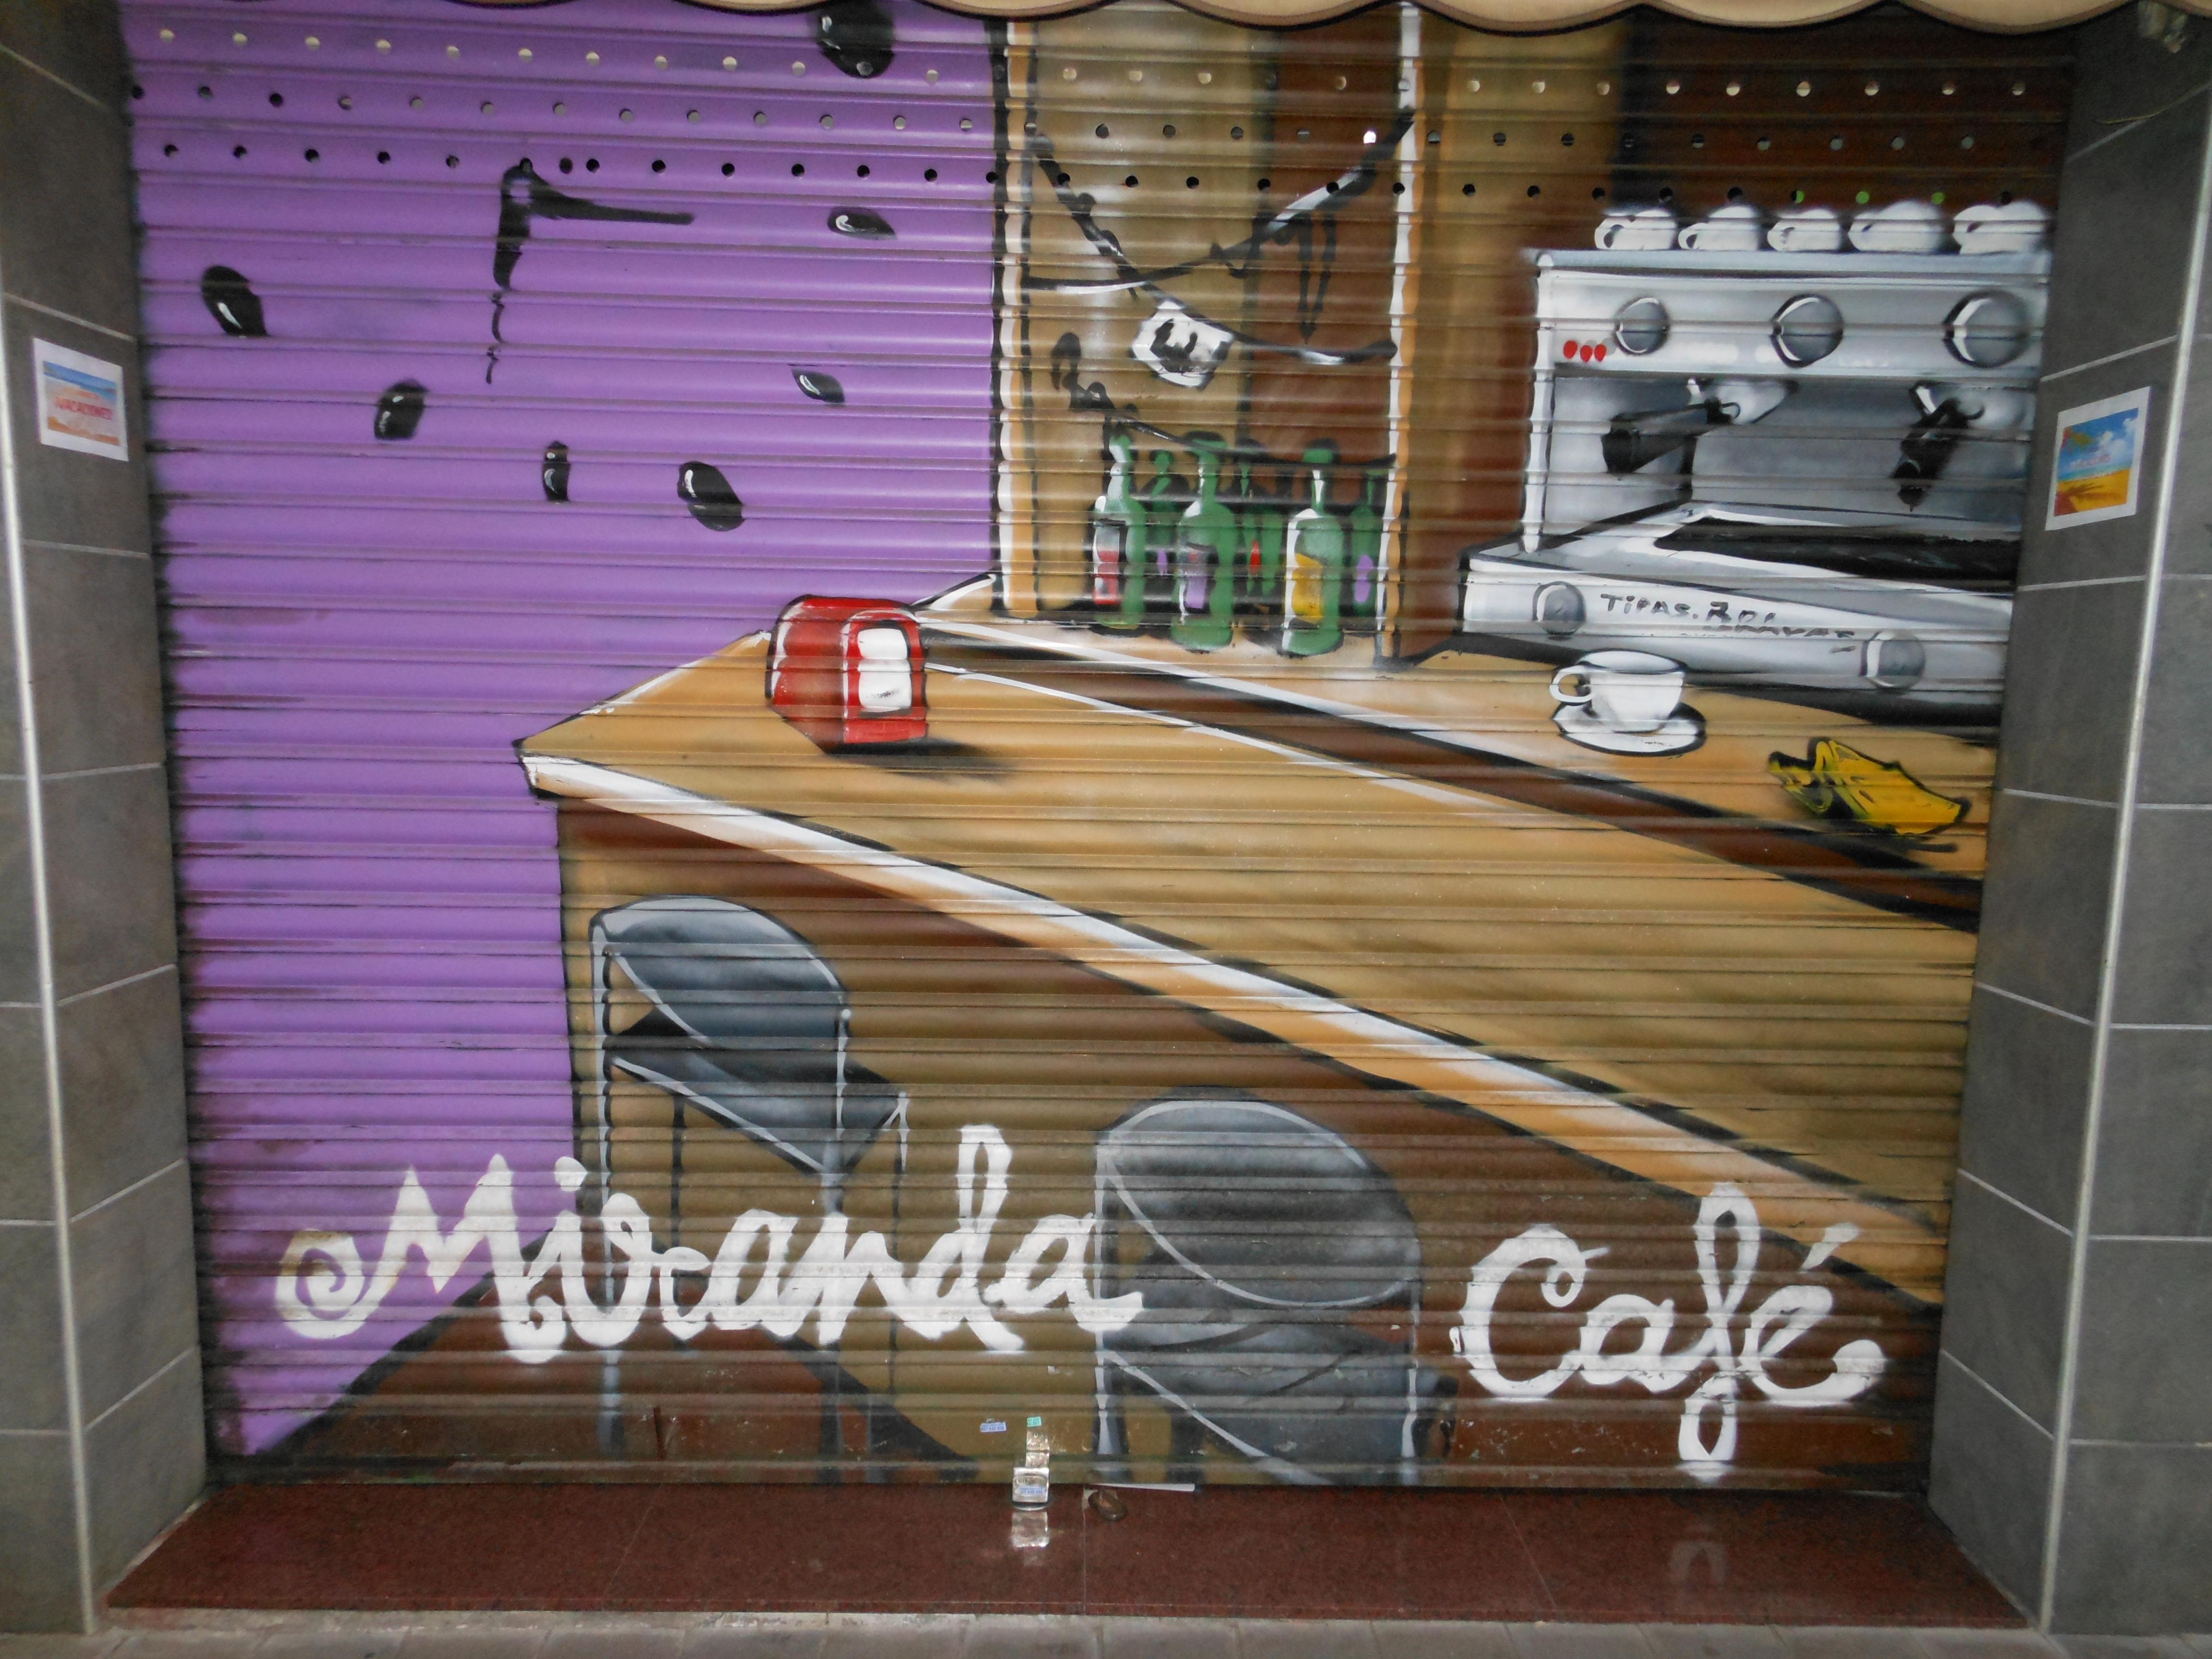 Filemiranda café graffiti dscn3207 jpg